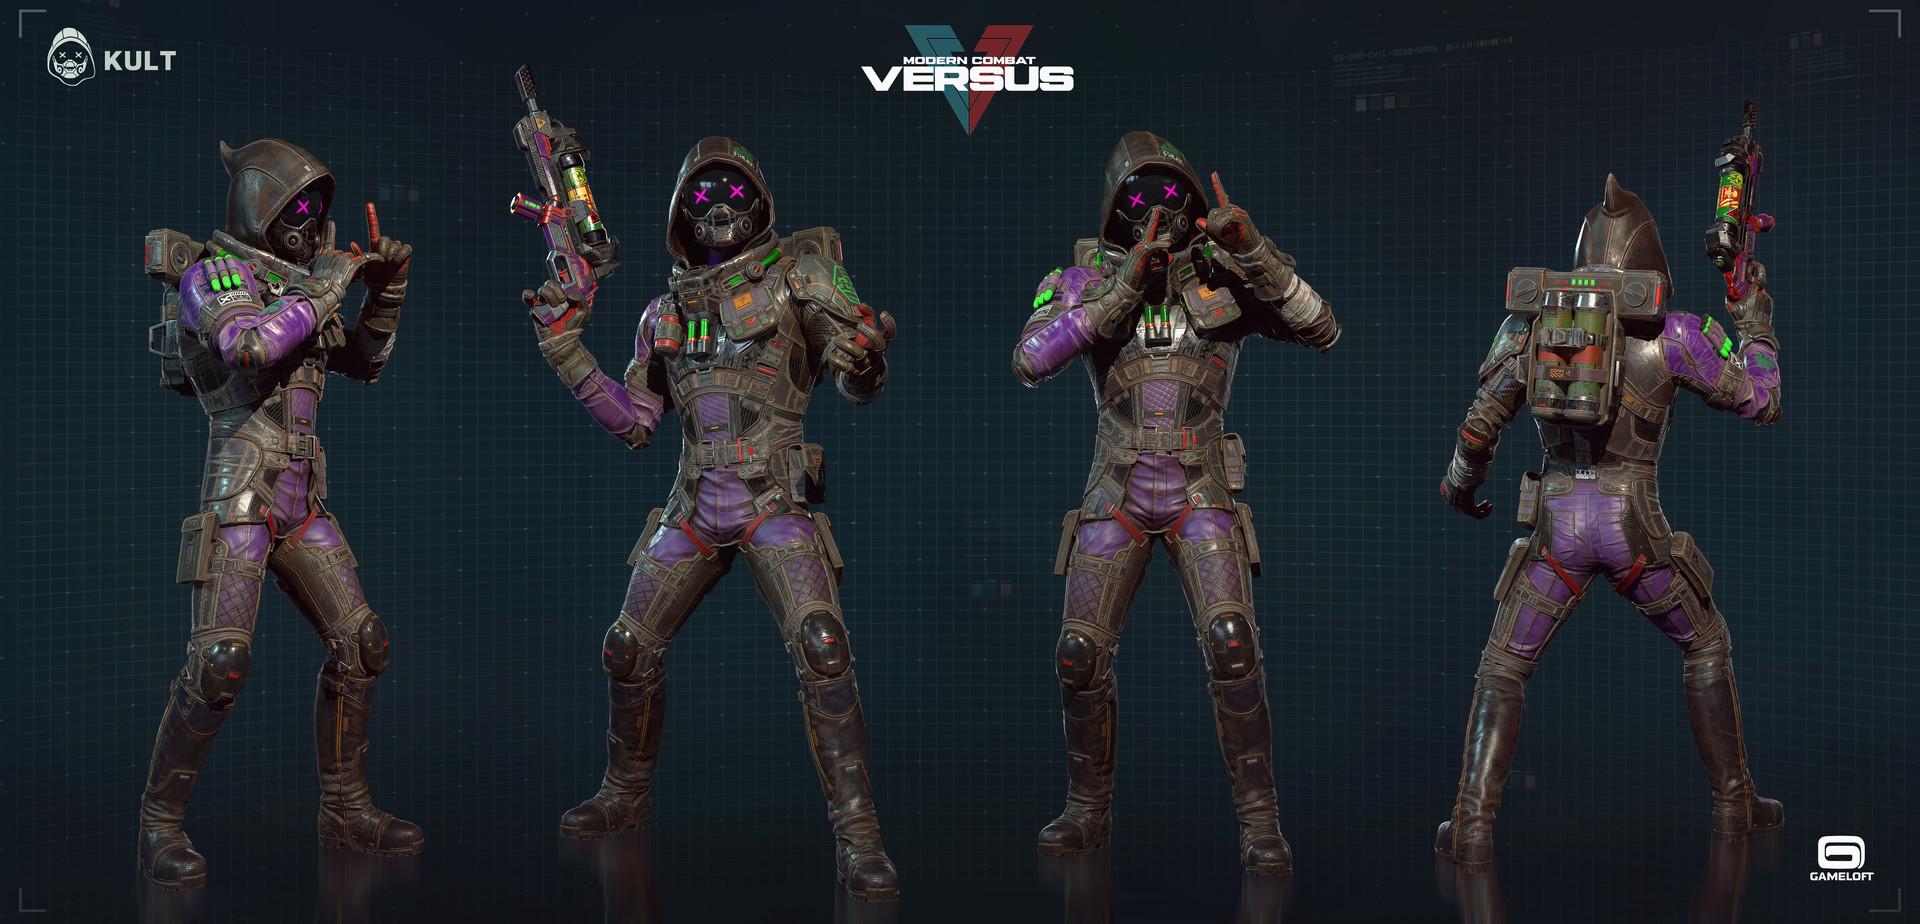 Rodrigue Pralier Kult Modern Combat Versus Gameloft